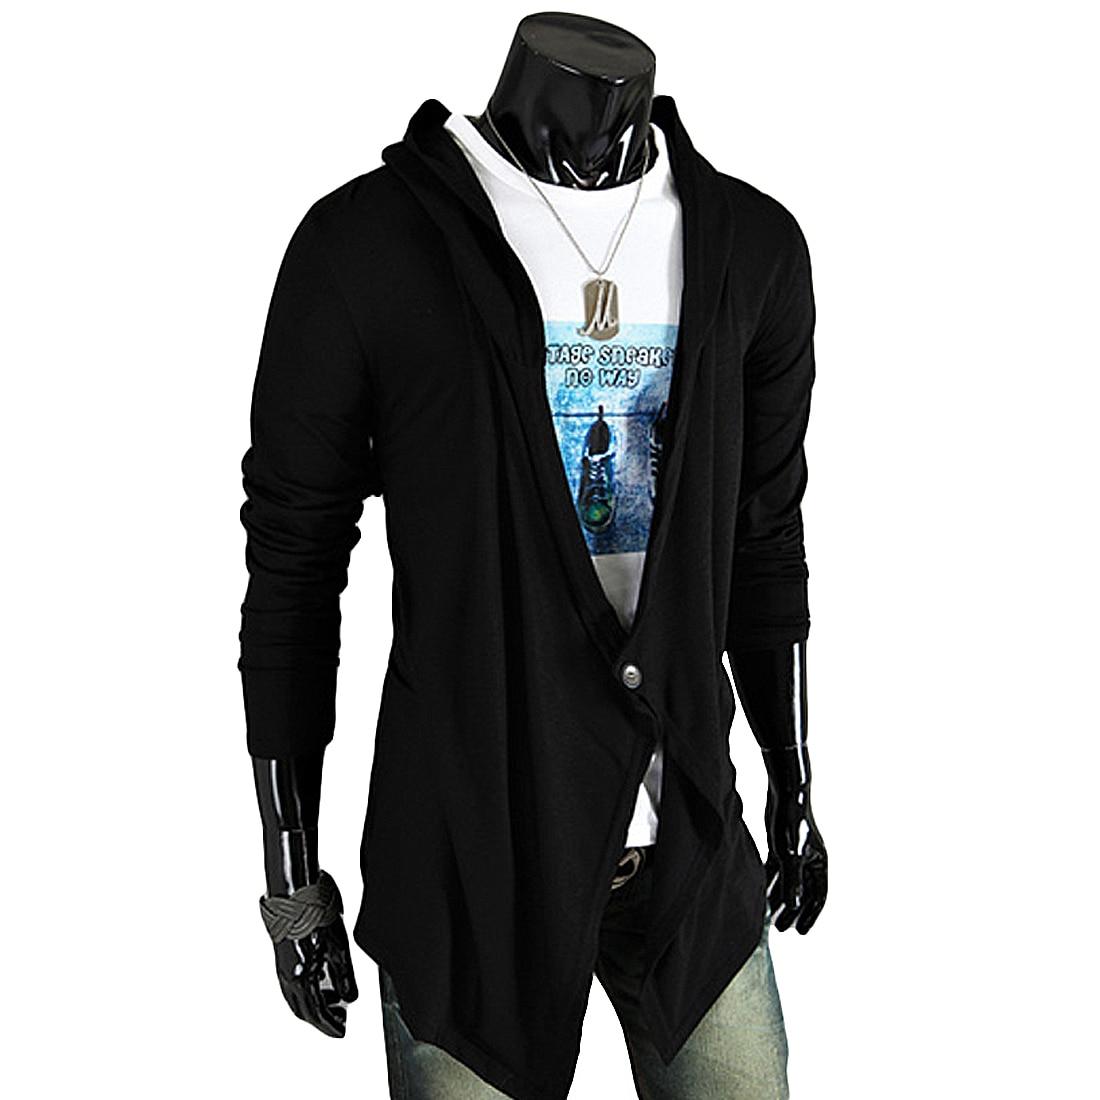 Aliexpress.com : Buy 2017 New Men cardigan Sweater Fashion Button ...